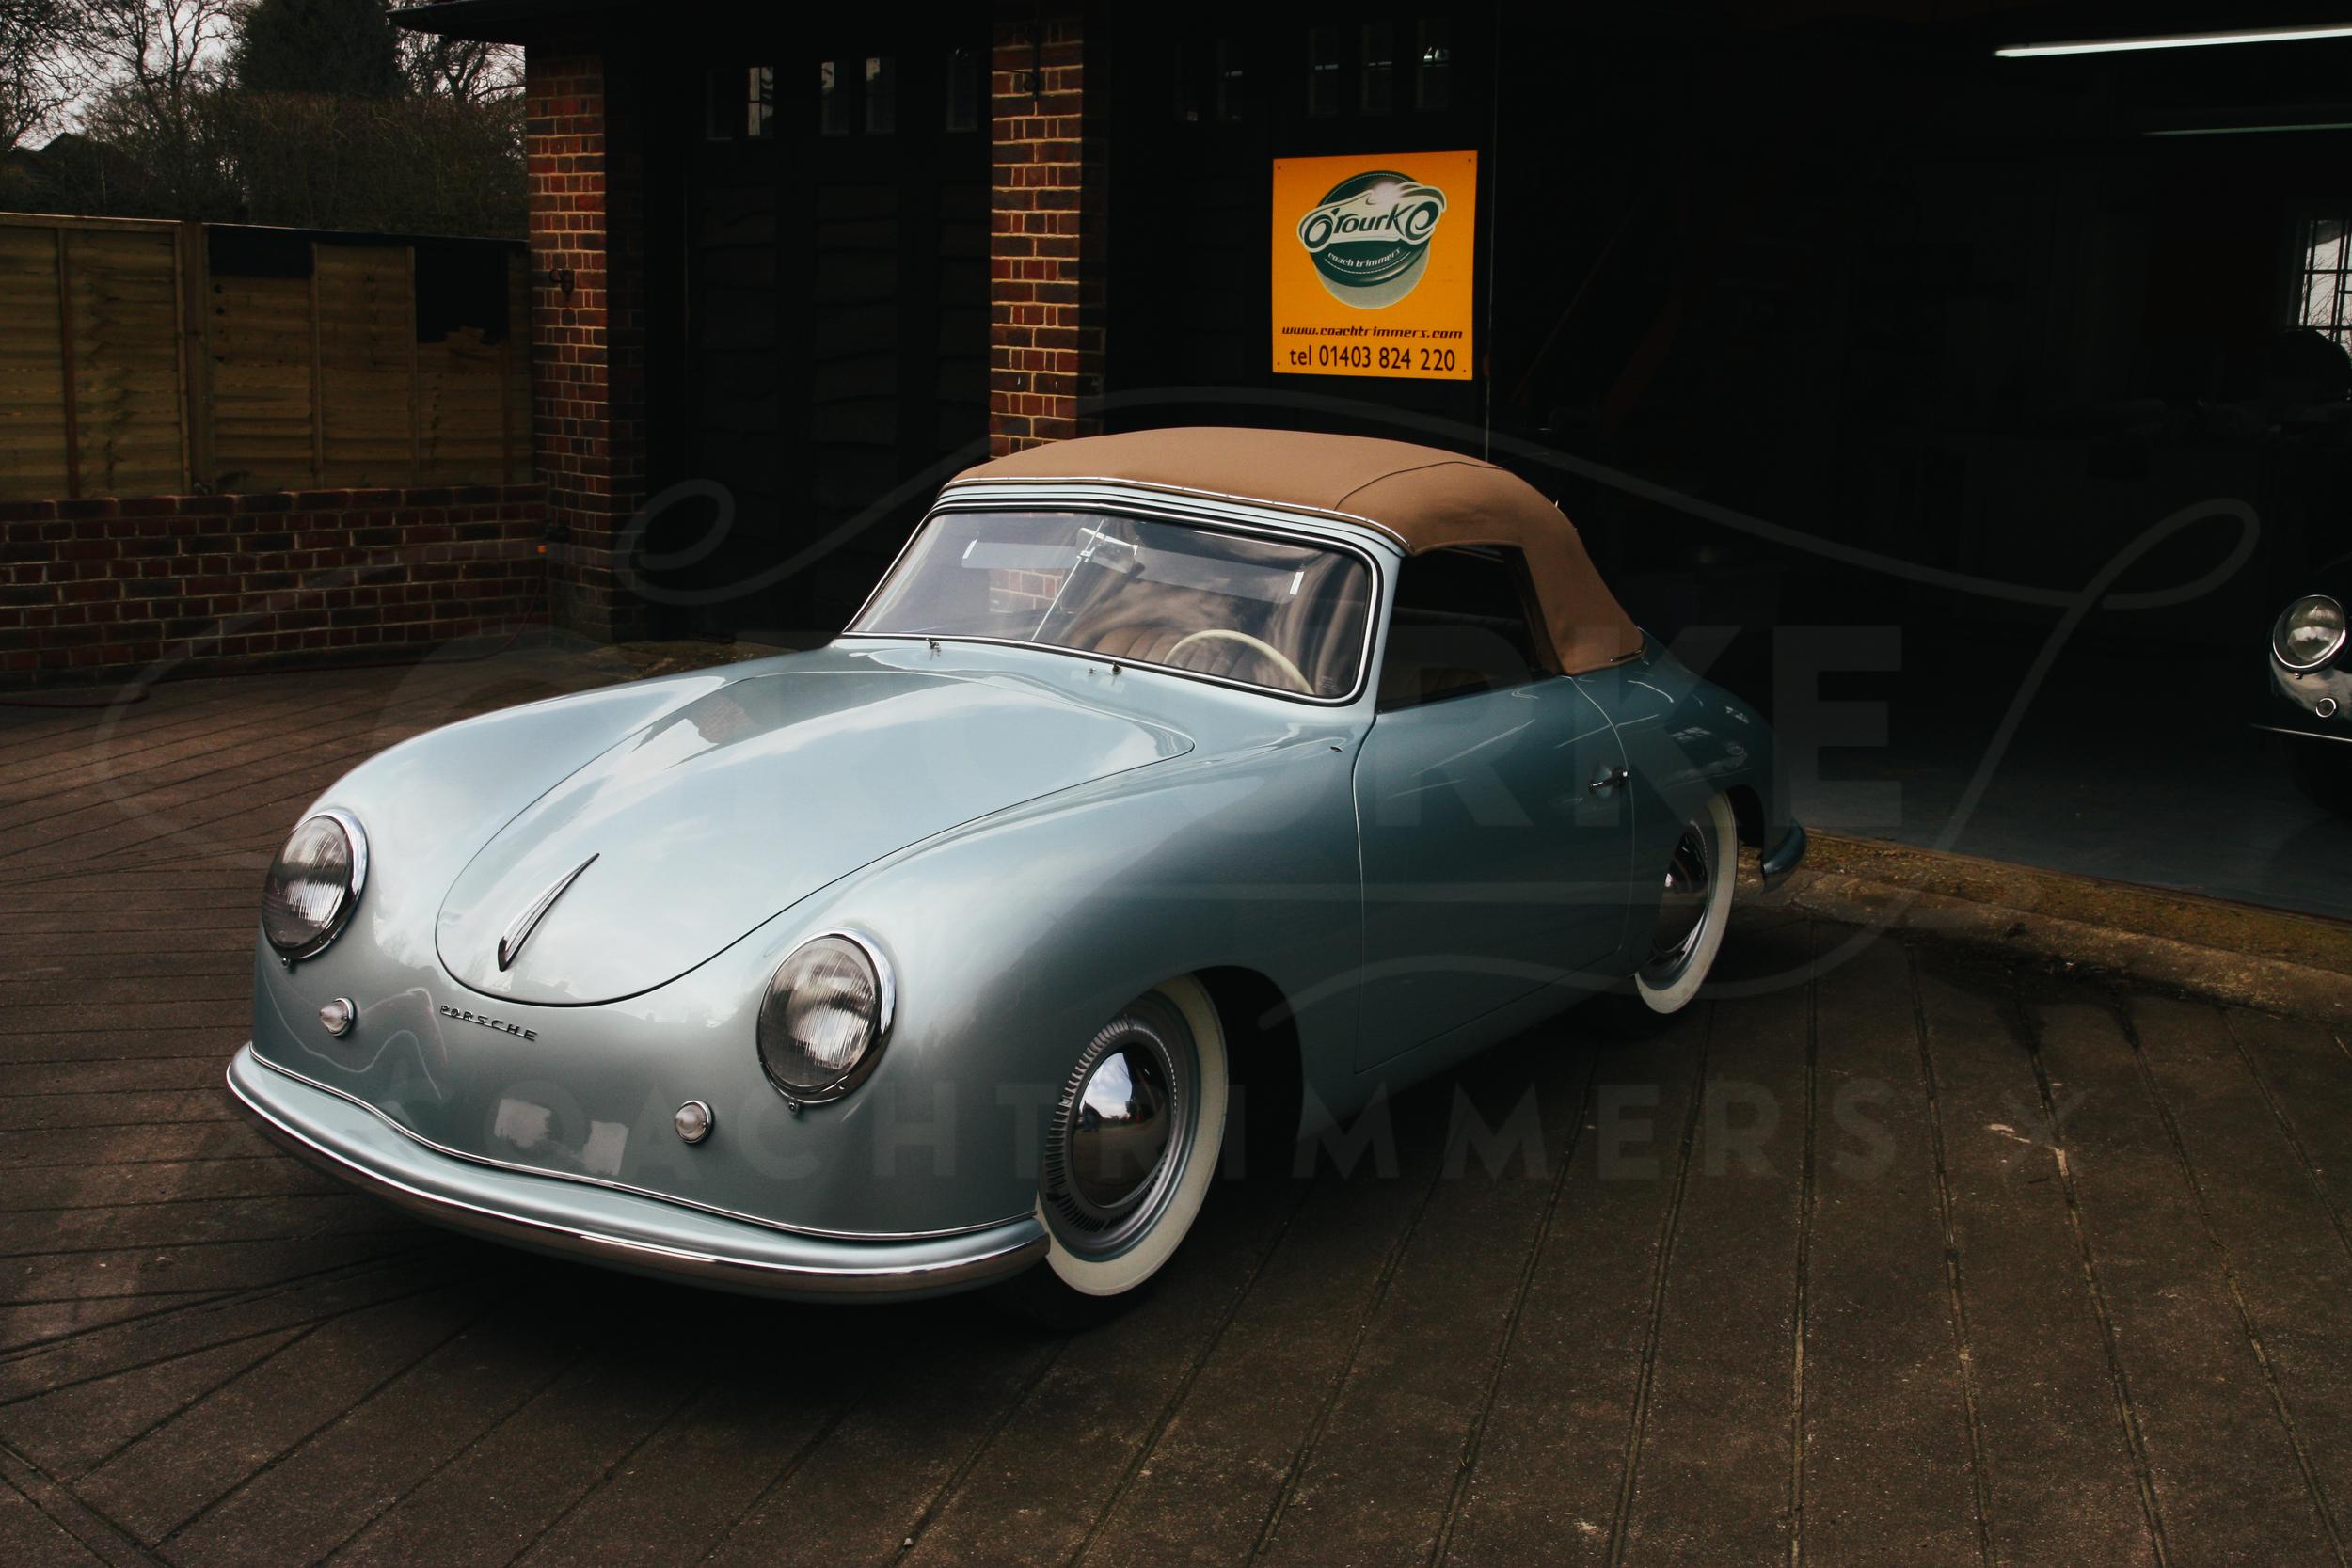 o-rourke-coachtrimmers-porsche-356-cabriolet.jpg